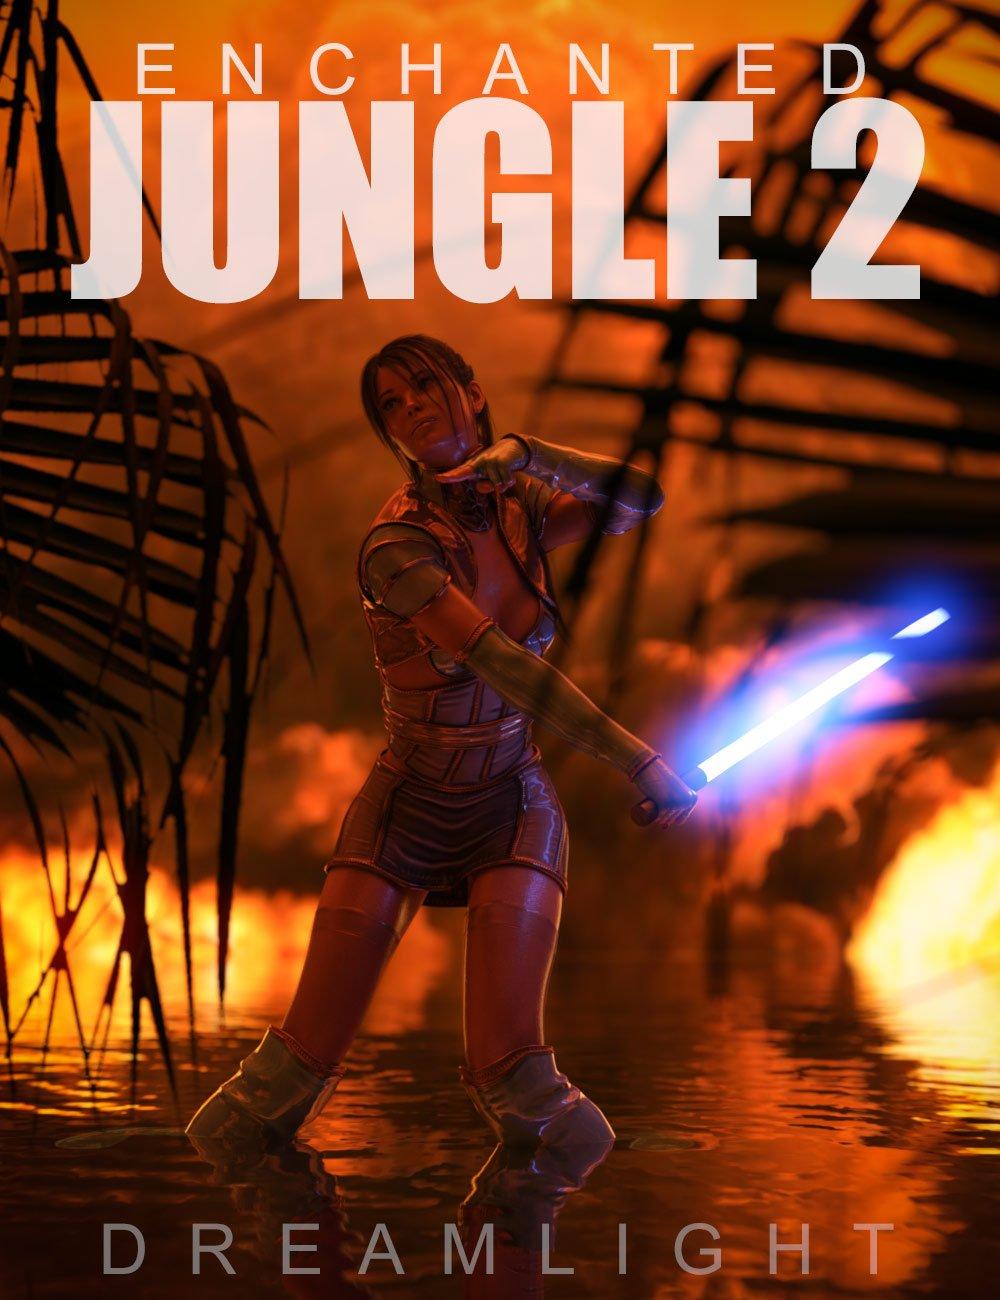 Enchanted Jungle Backgrounds 2 by: Dreamlight, 3D Models by Daz 3D